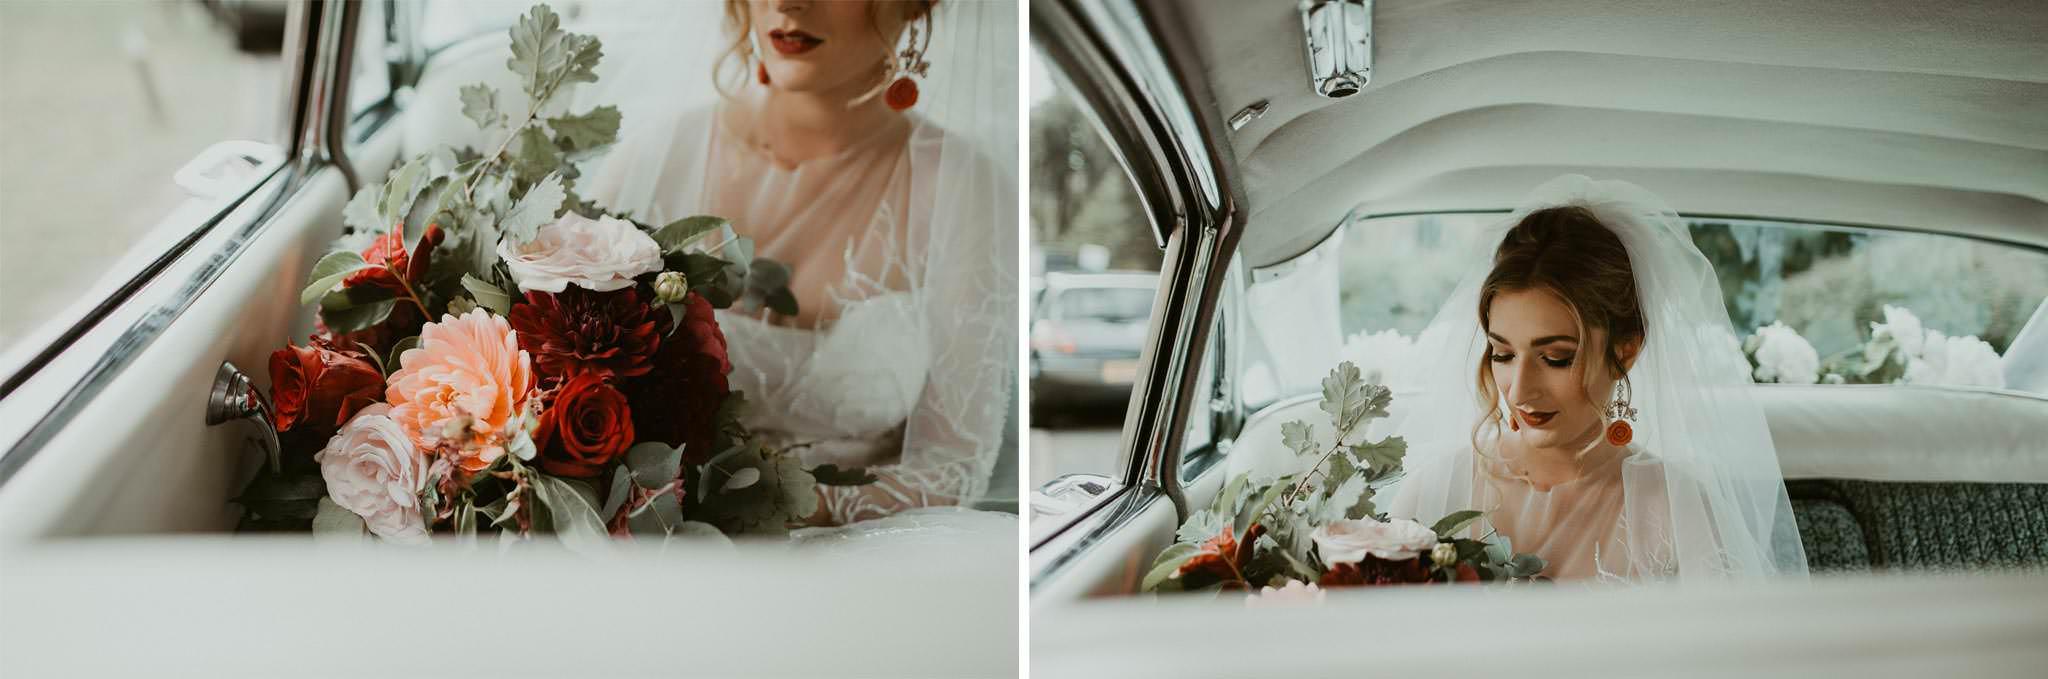 destination-wedding-photographer-051